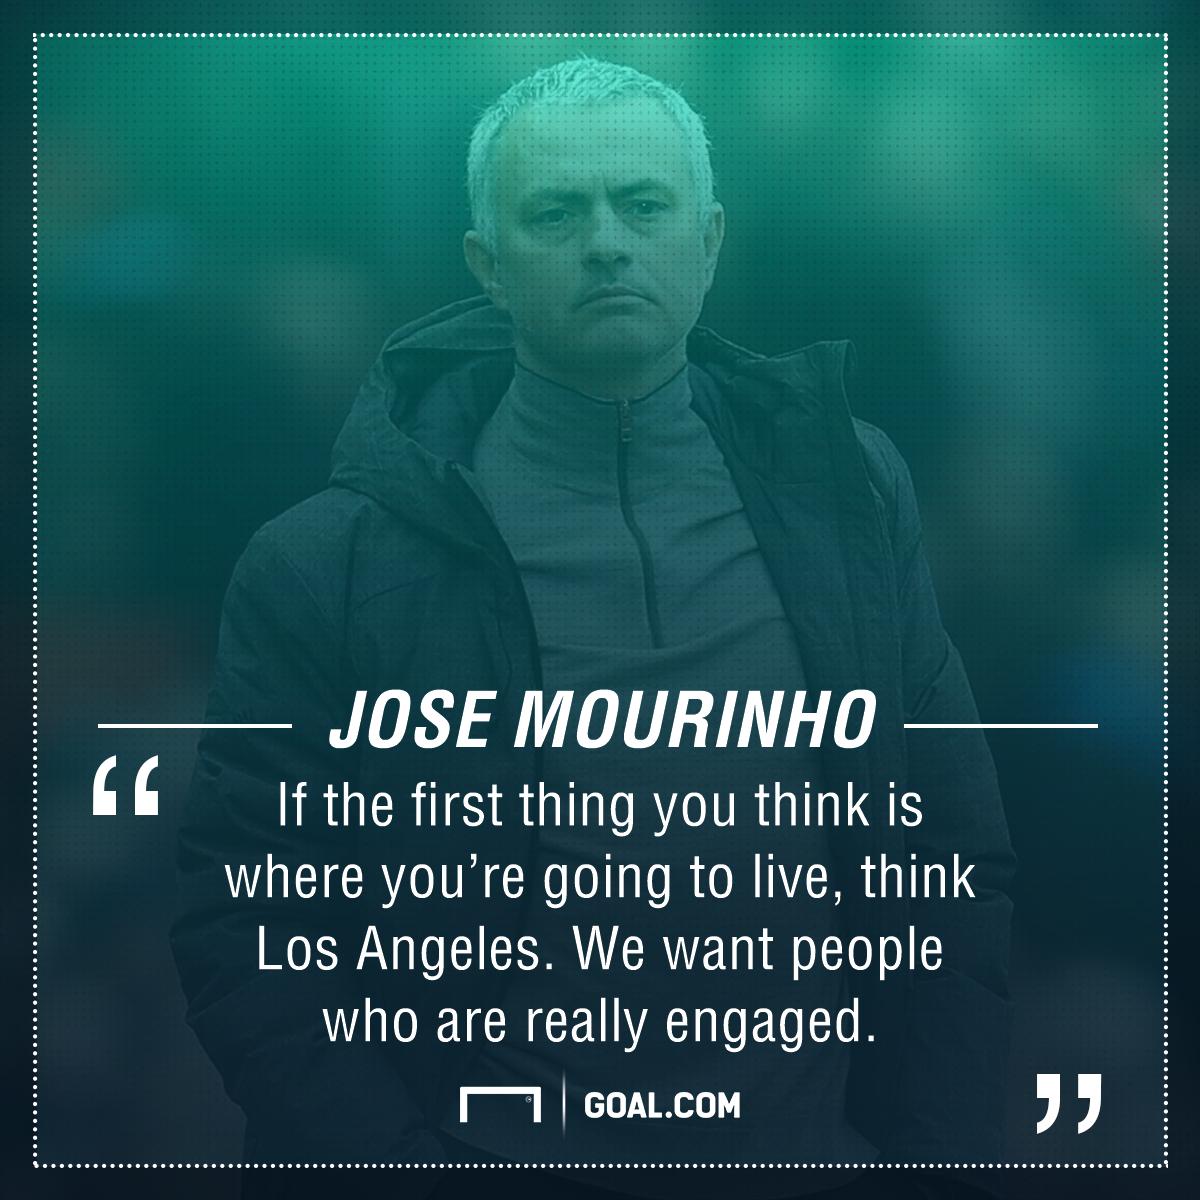 Mourinho laments lack of killer instinct as United stumble